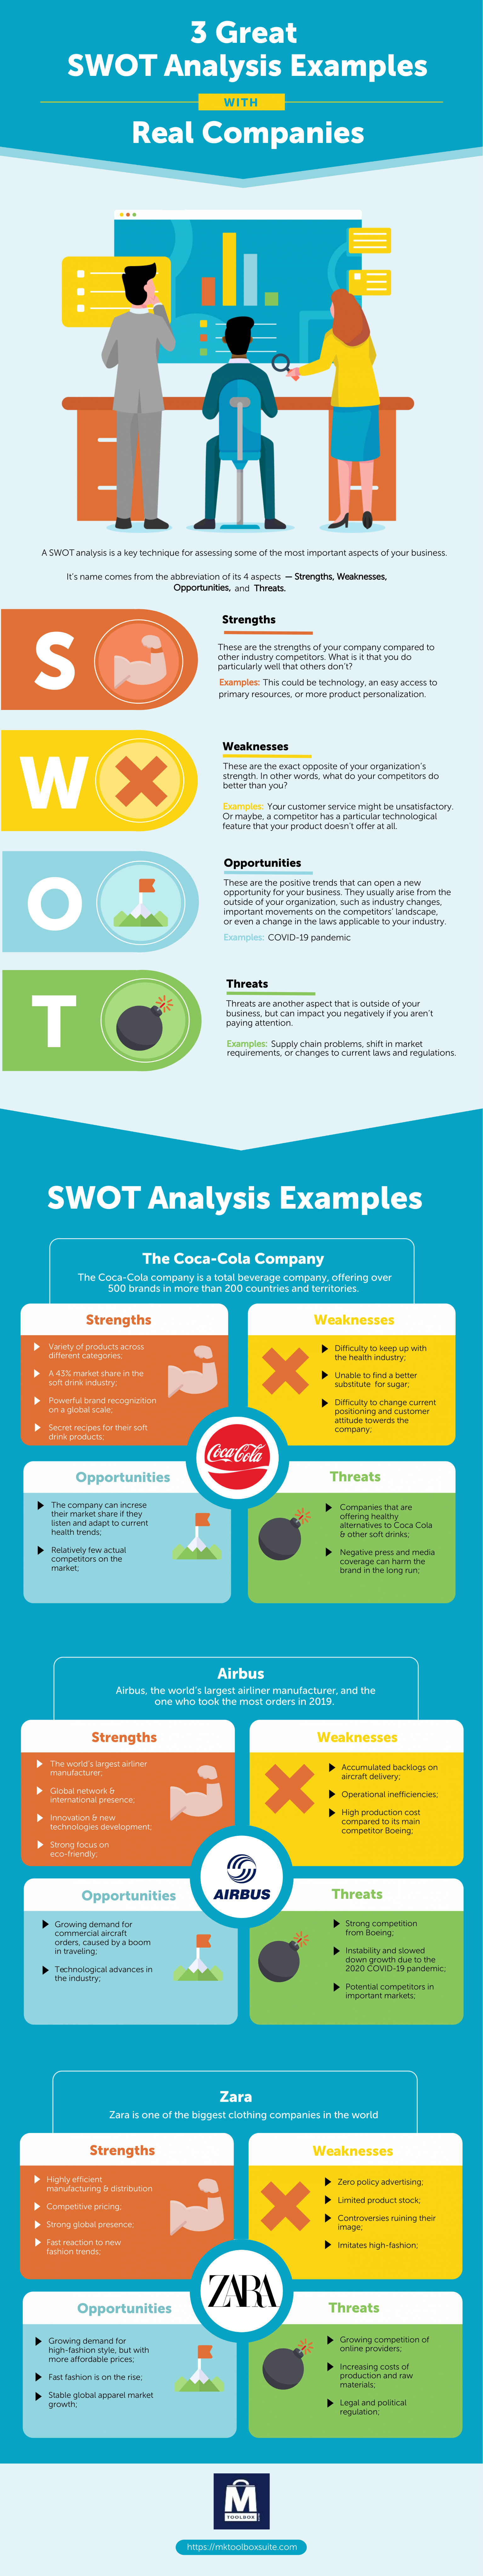 SWOT analysis infographic